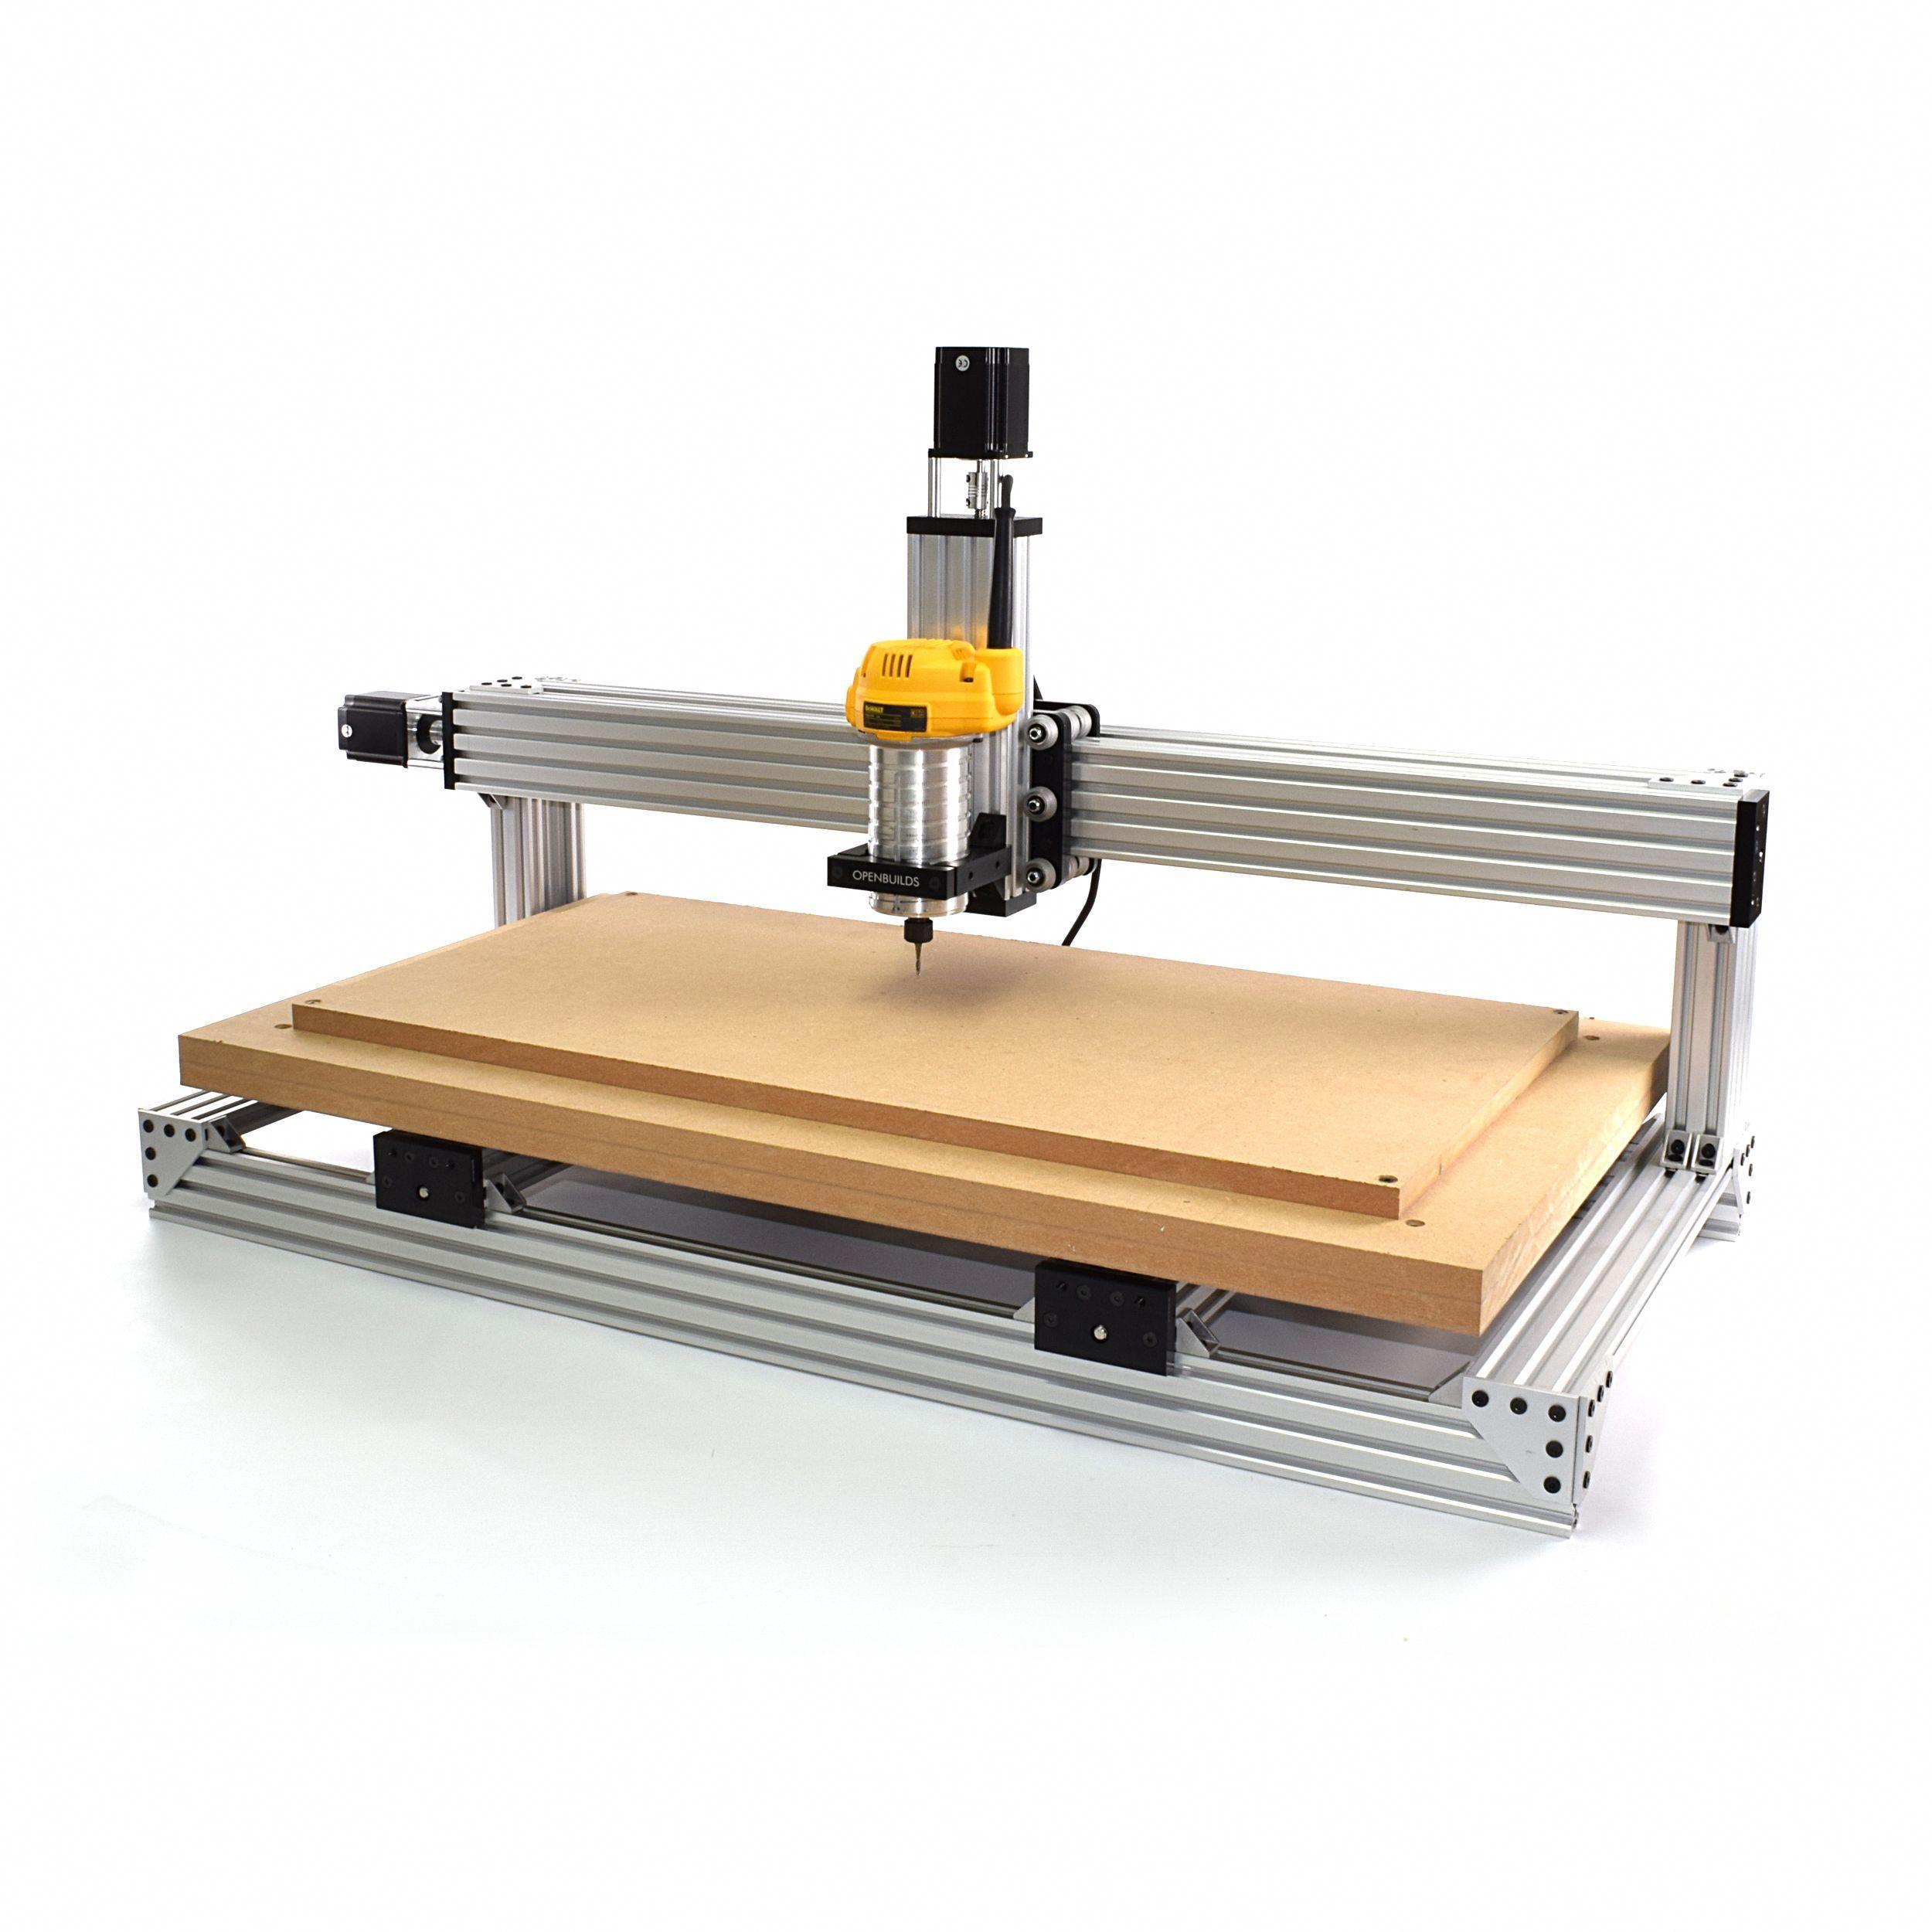 Cbeam xl mechanical kit hobbycnc hobby cnc hobby